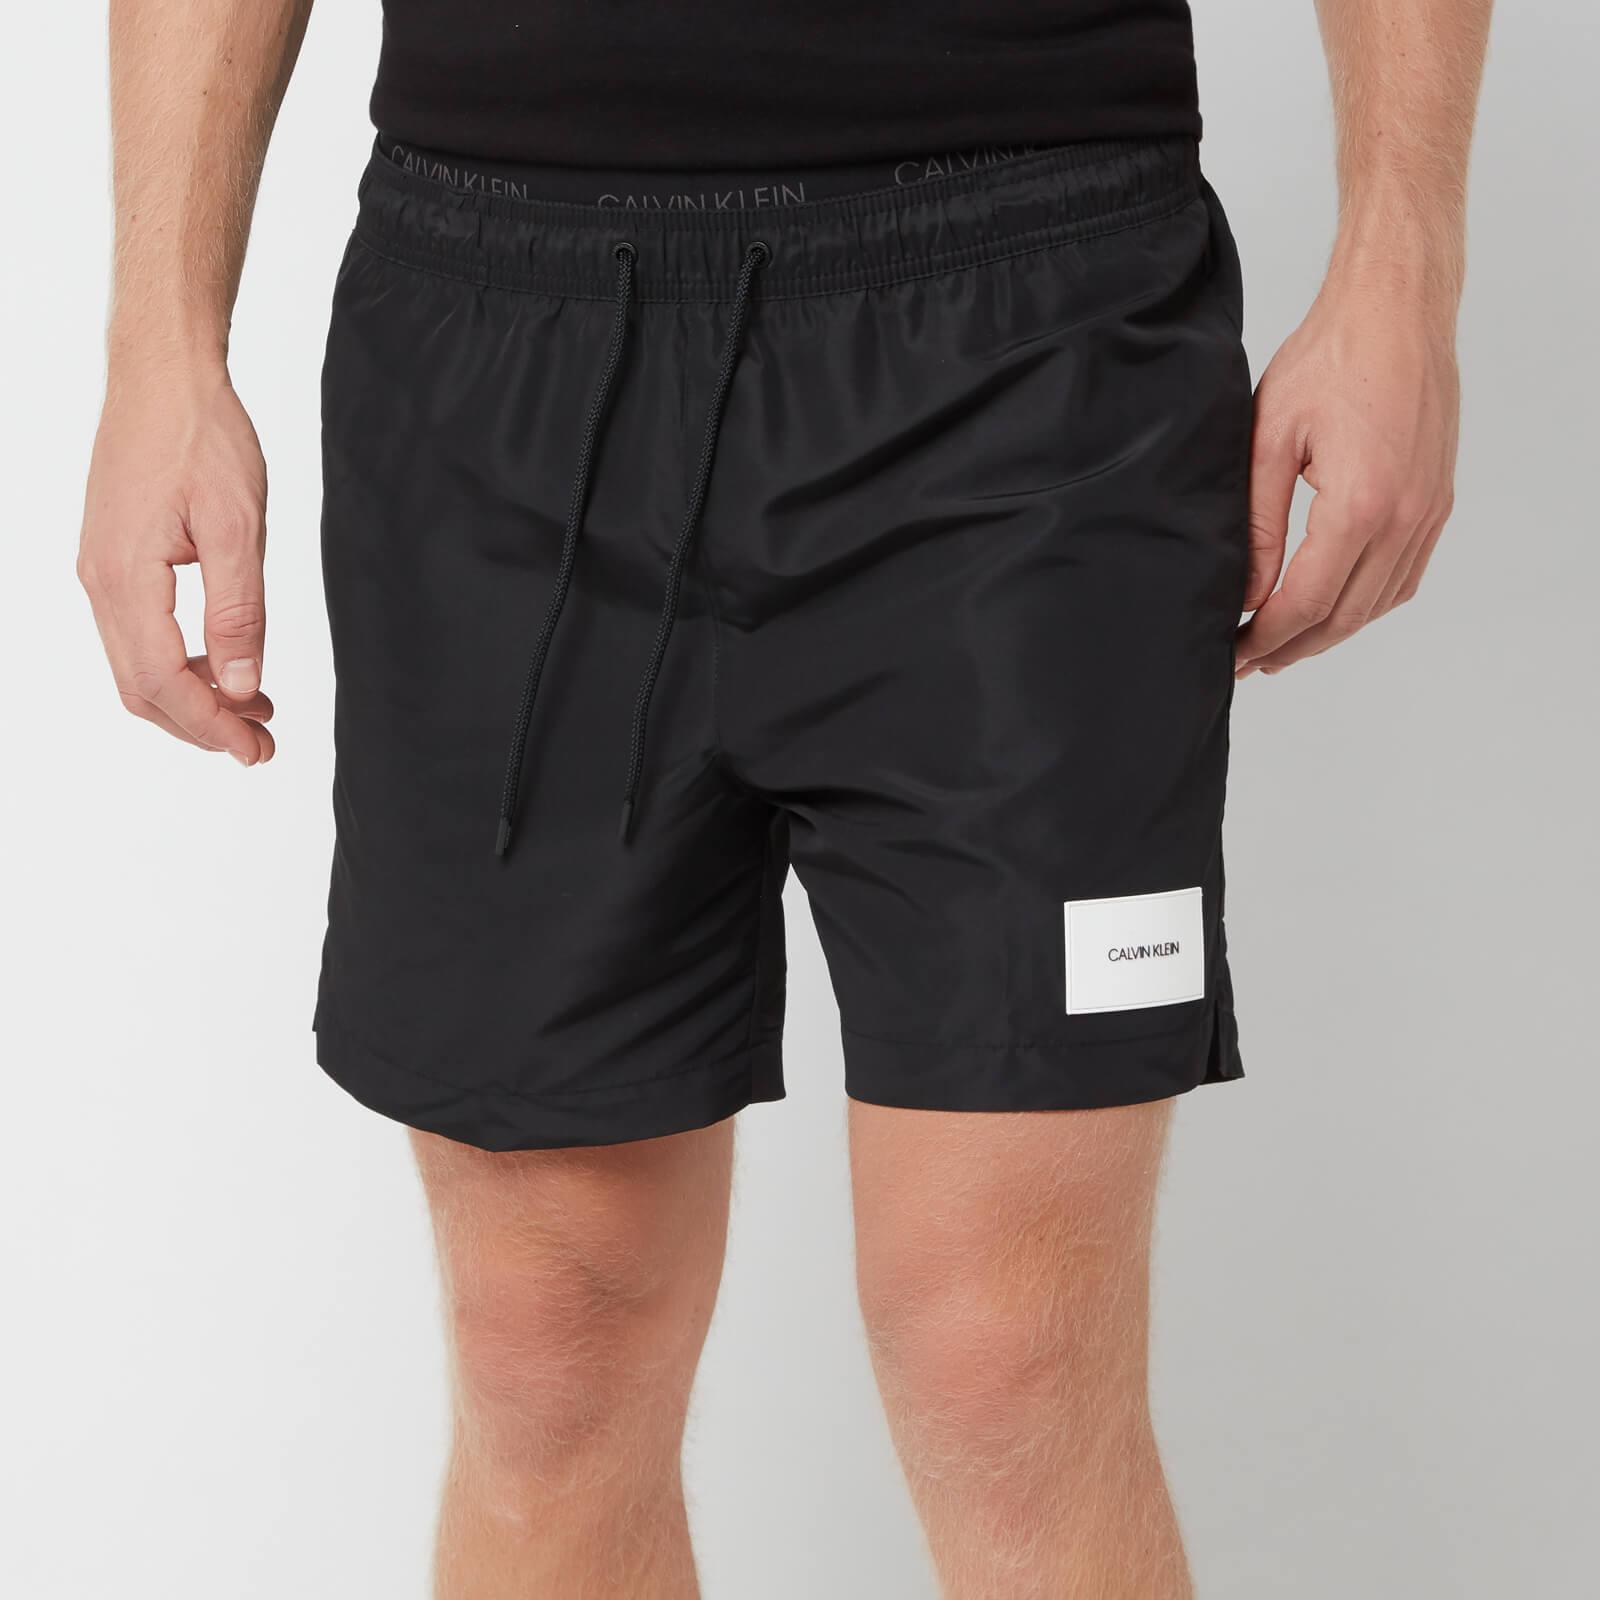 Calvin Klein Men's Medium Double Waistband Swim Shorts - Black - M - Black